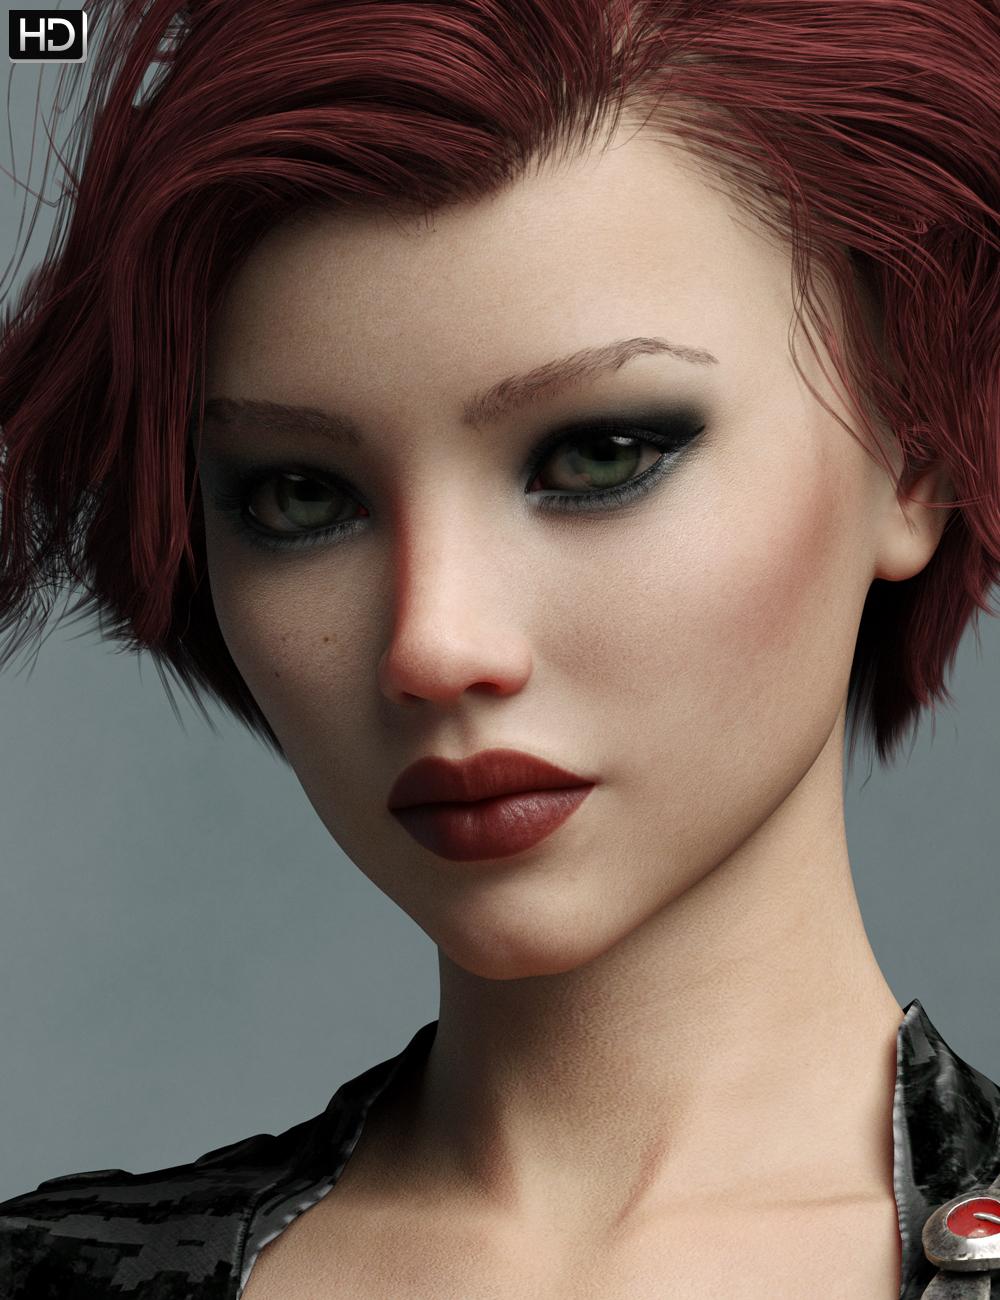 Charlie HD for Genesis 8 Female by: Emrys, 3D Models by Daz 3D